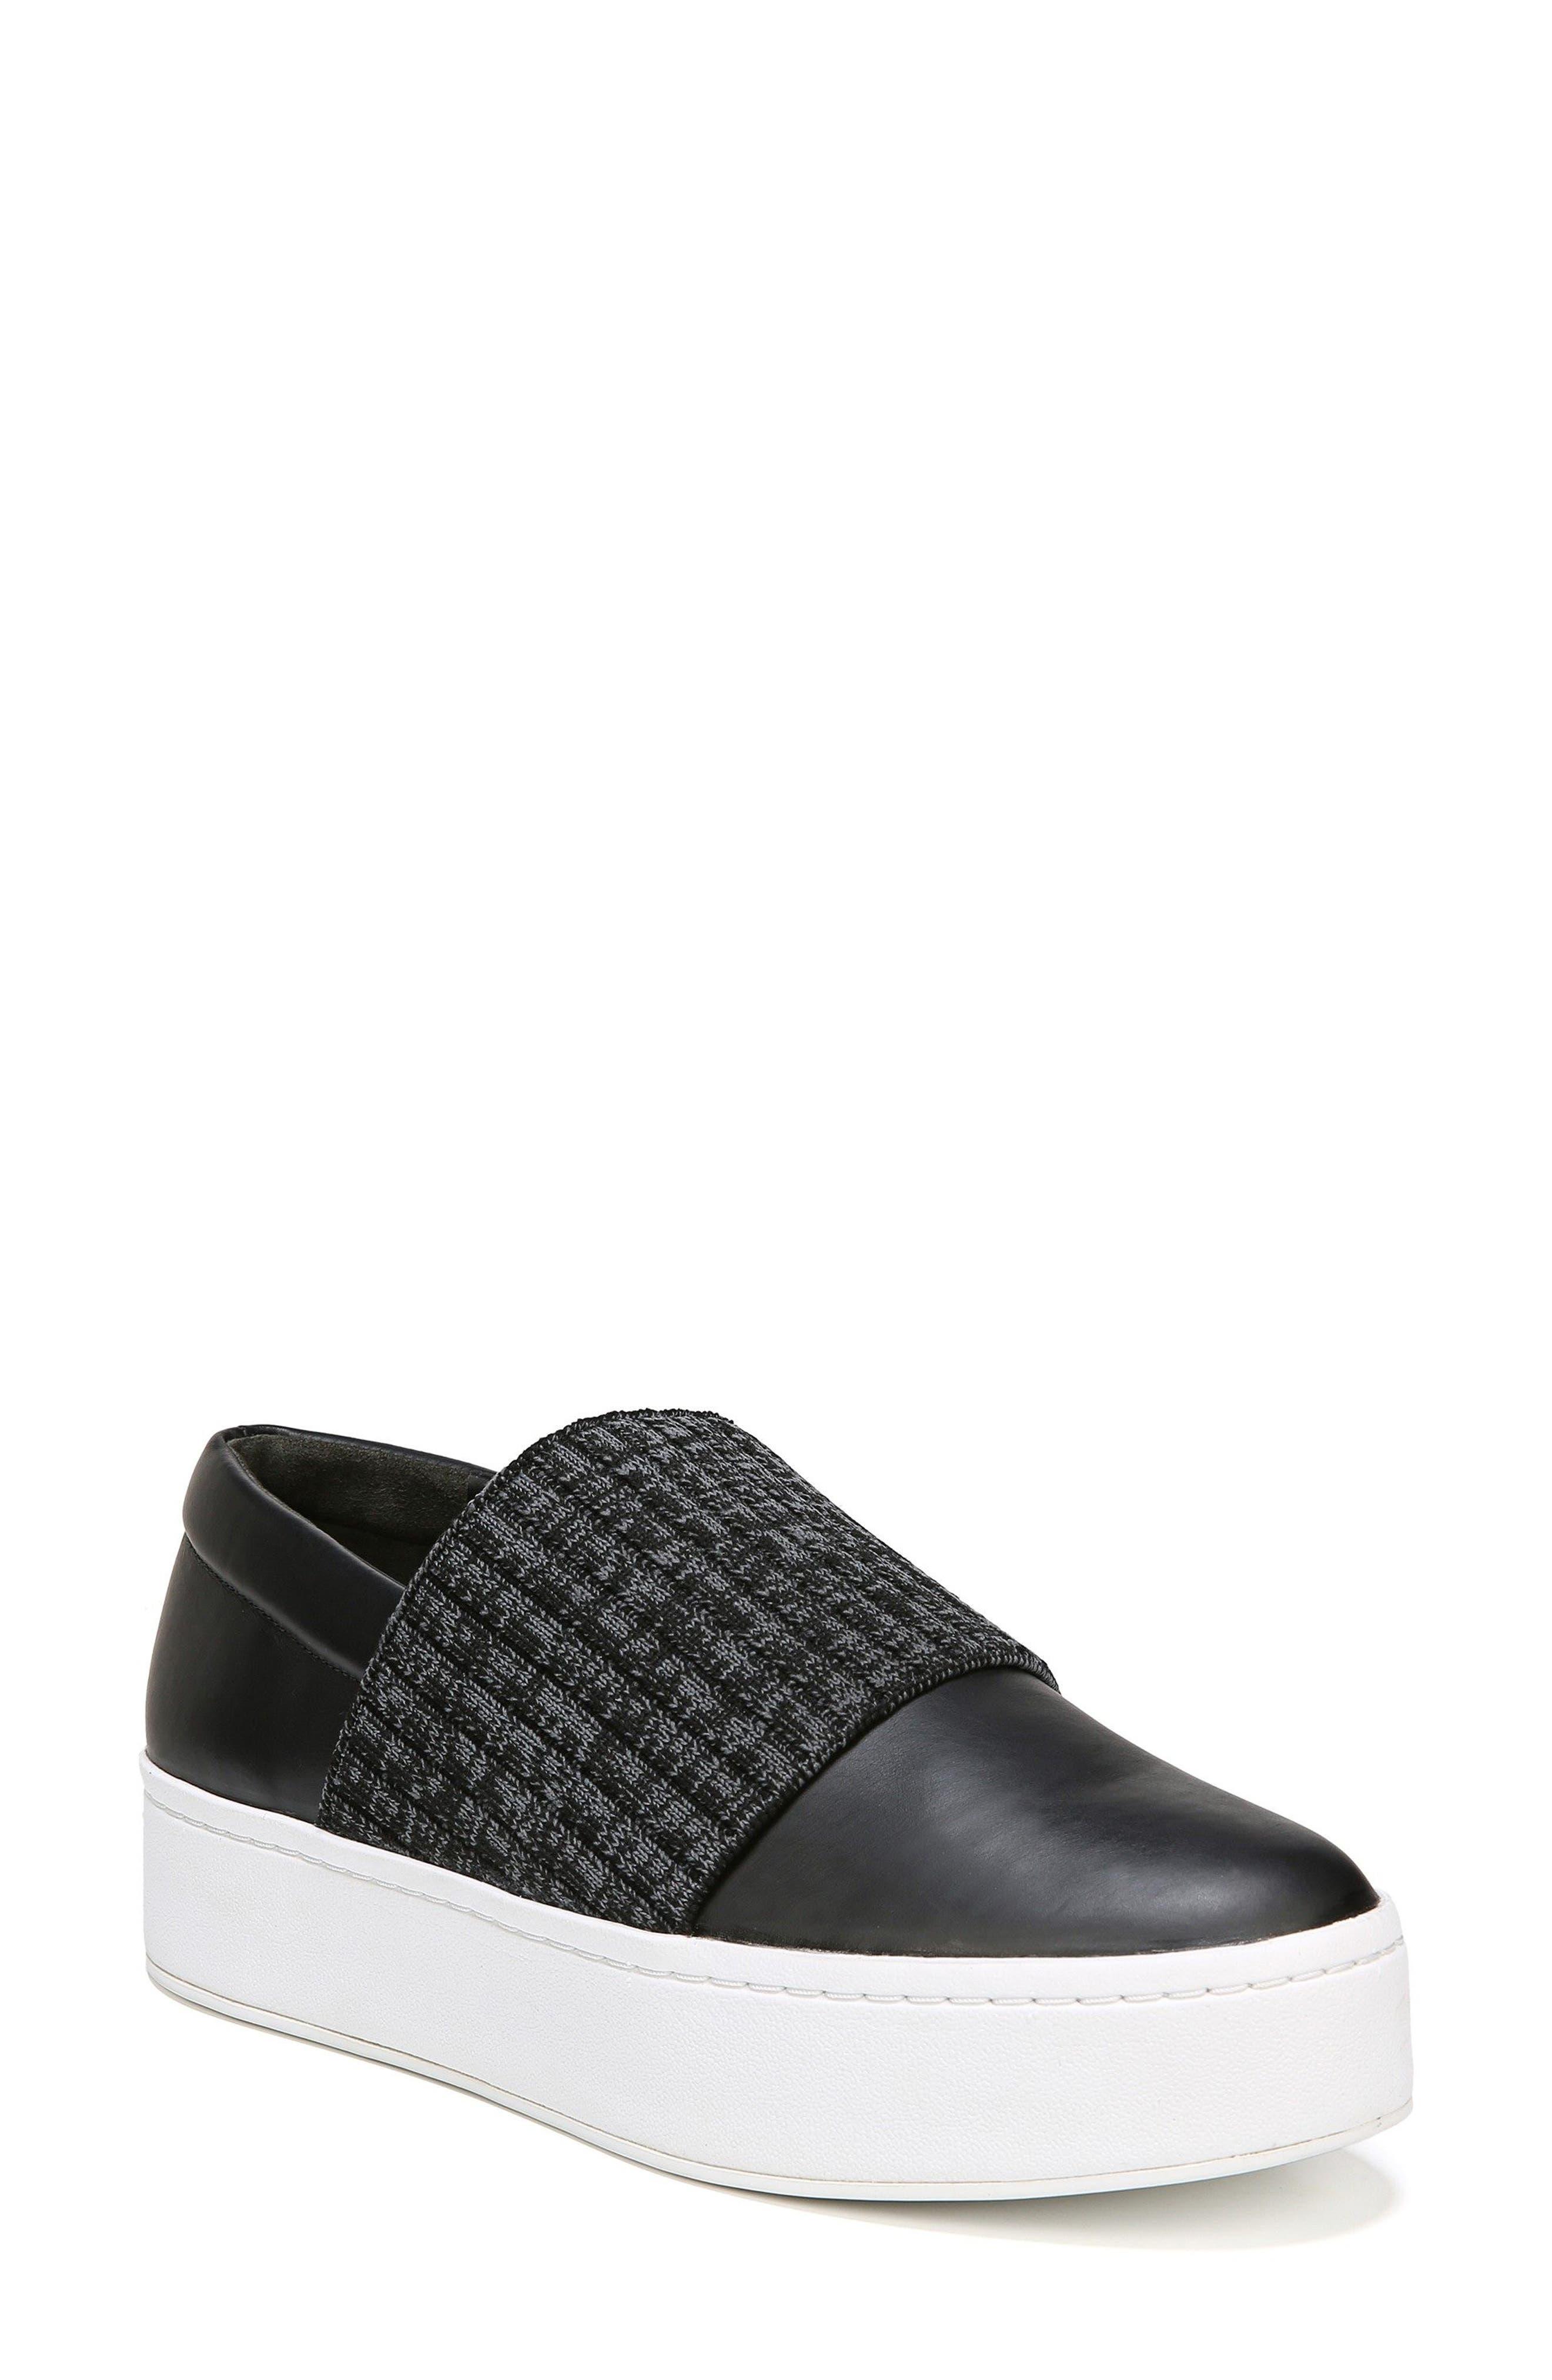 Weadon Slip-On Sneaker,                             Main thumbnail 1, color,                             Black Siviglia Calf